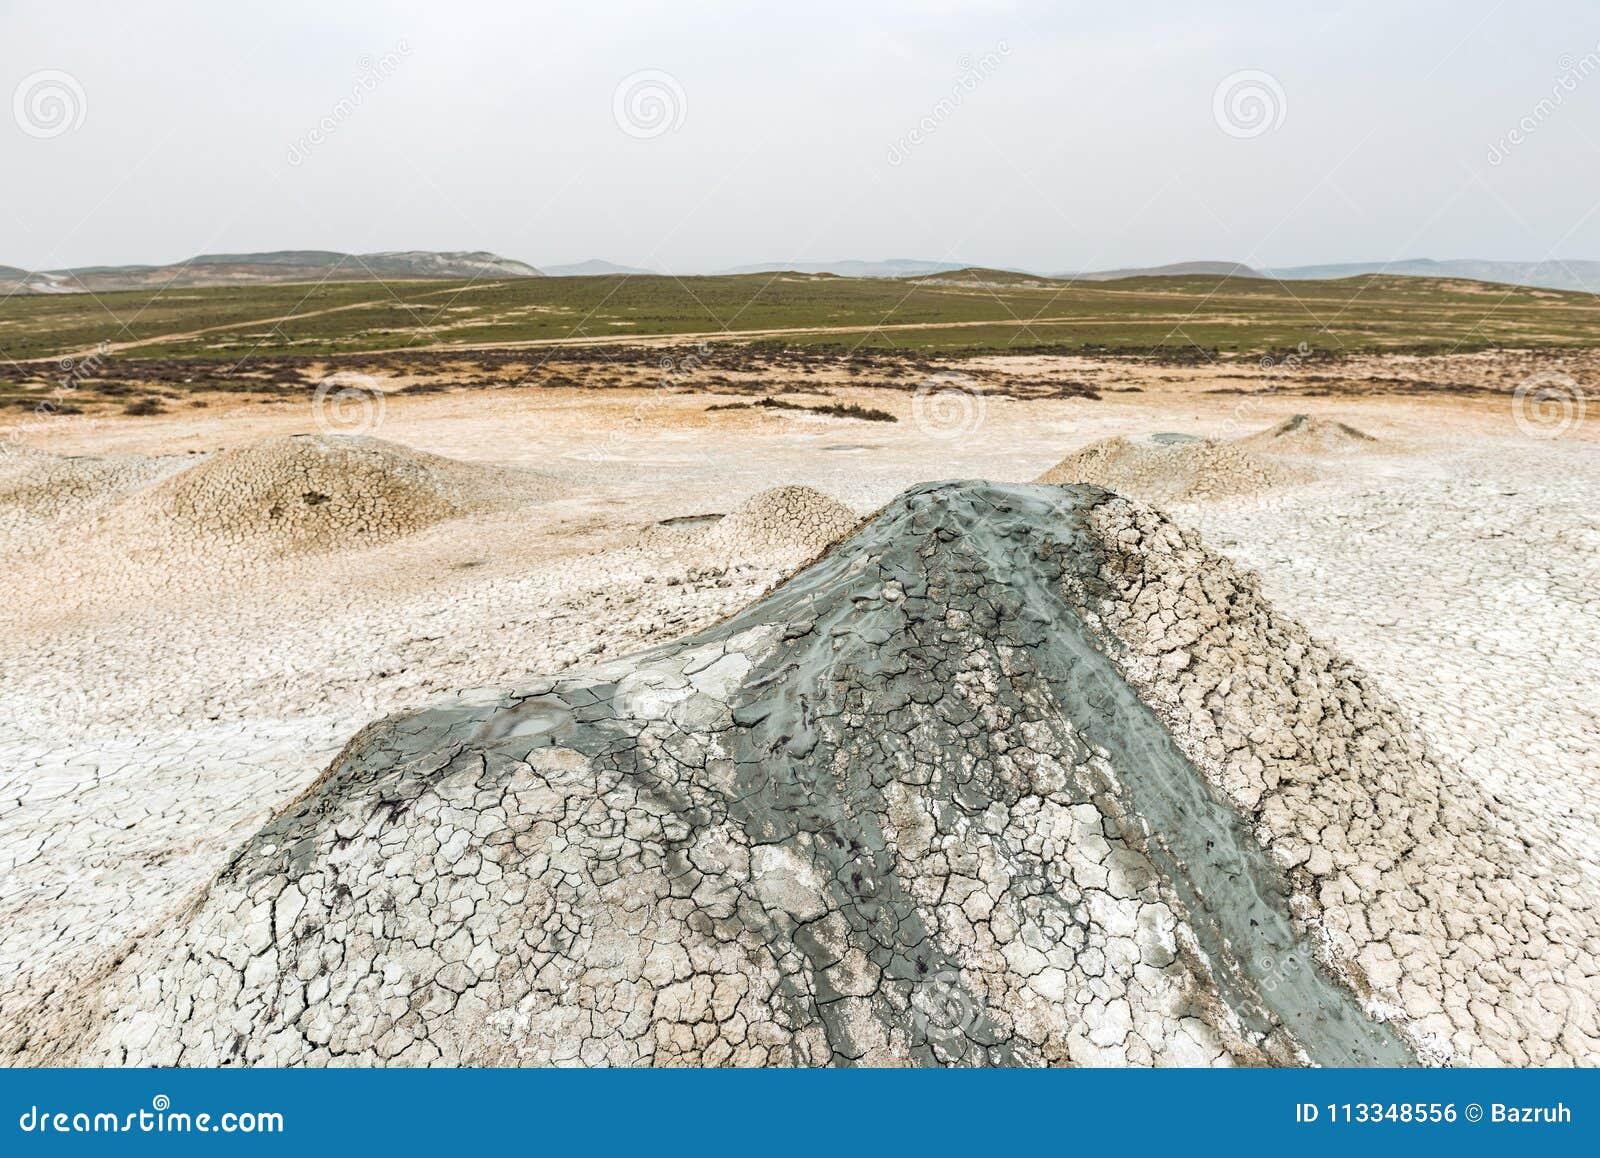 A small mud volcano